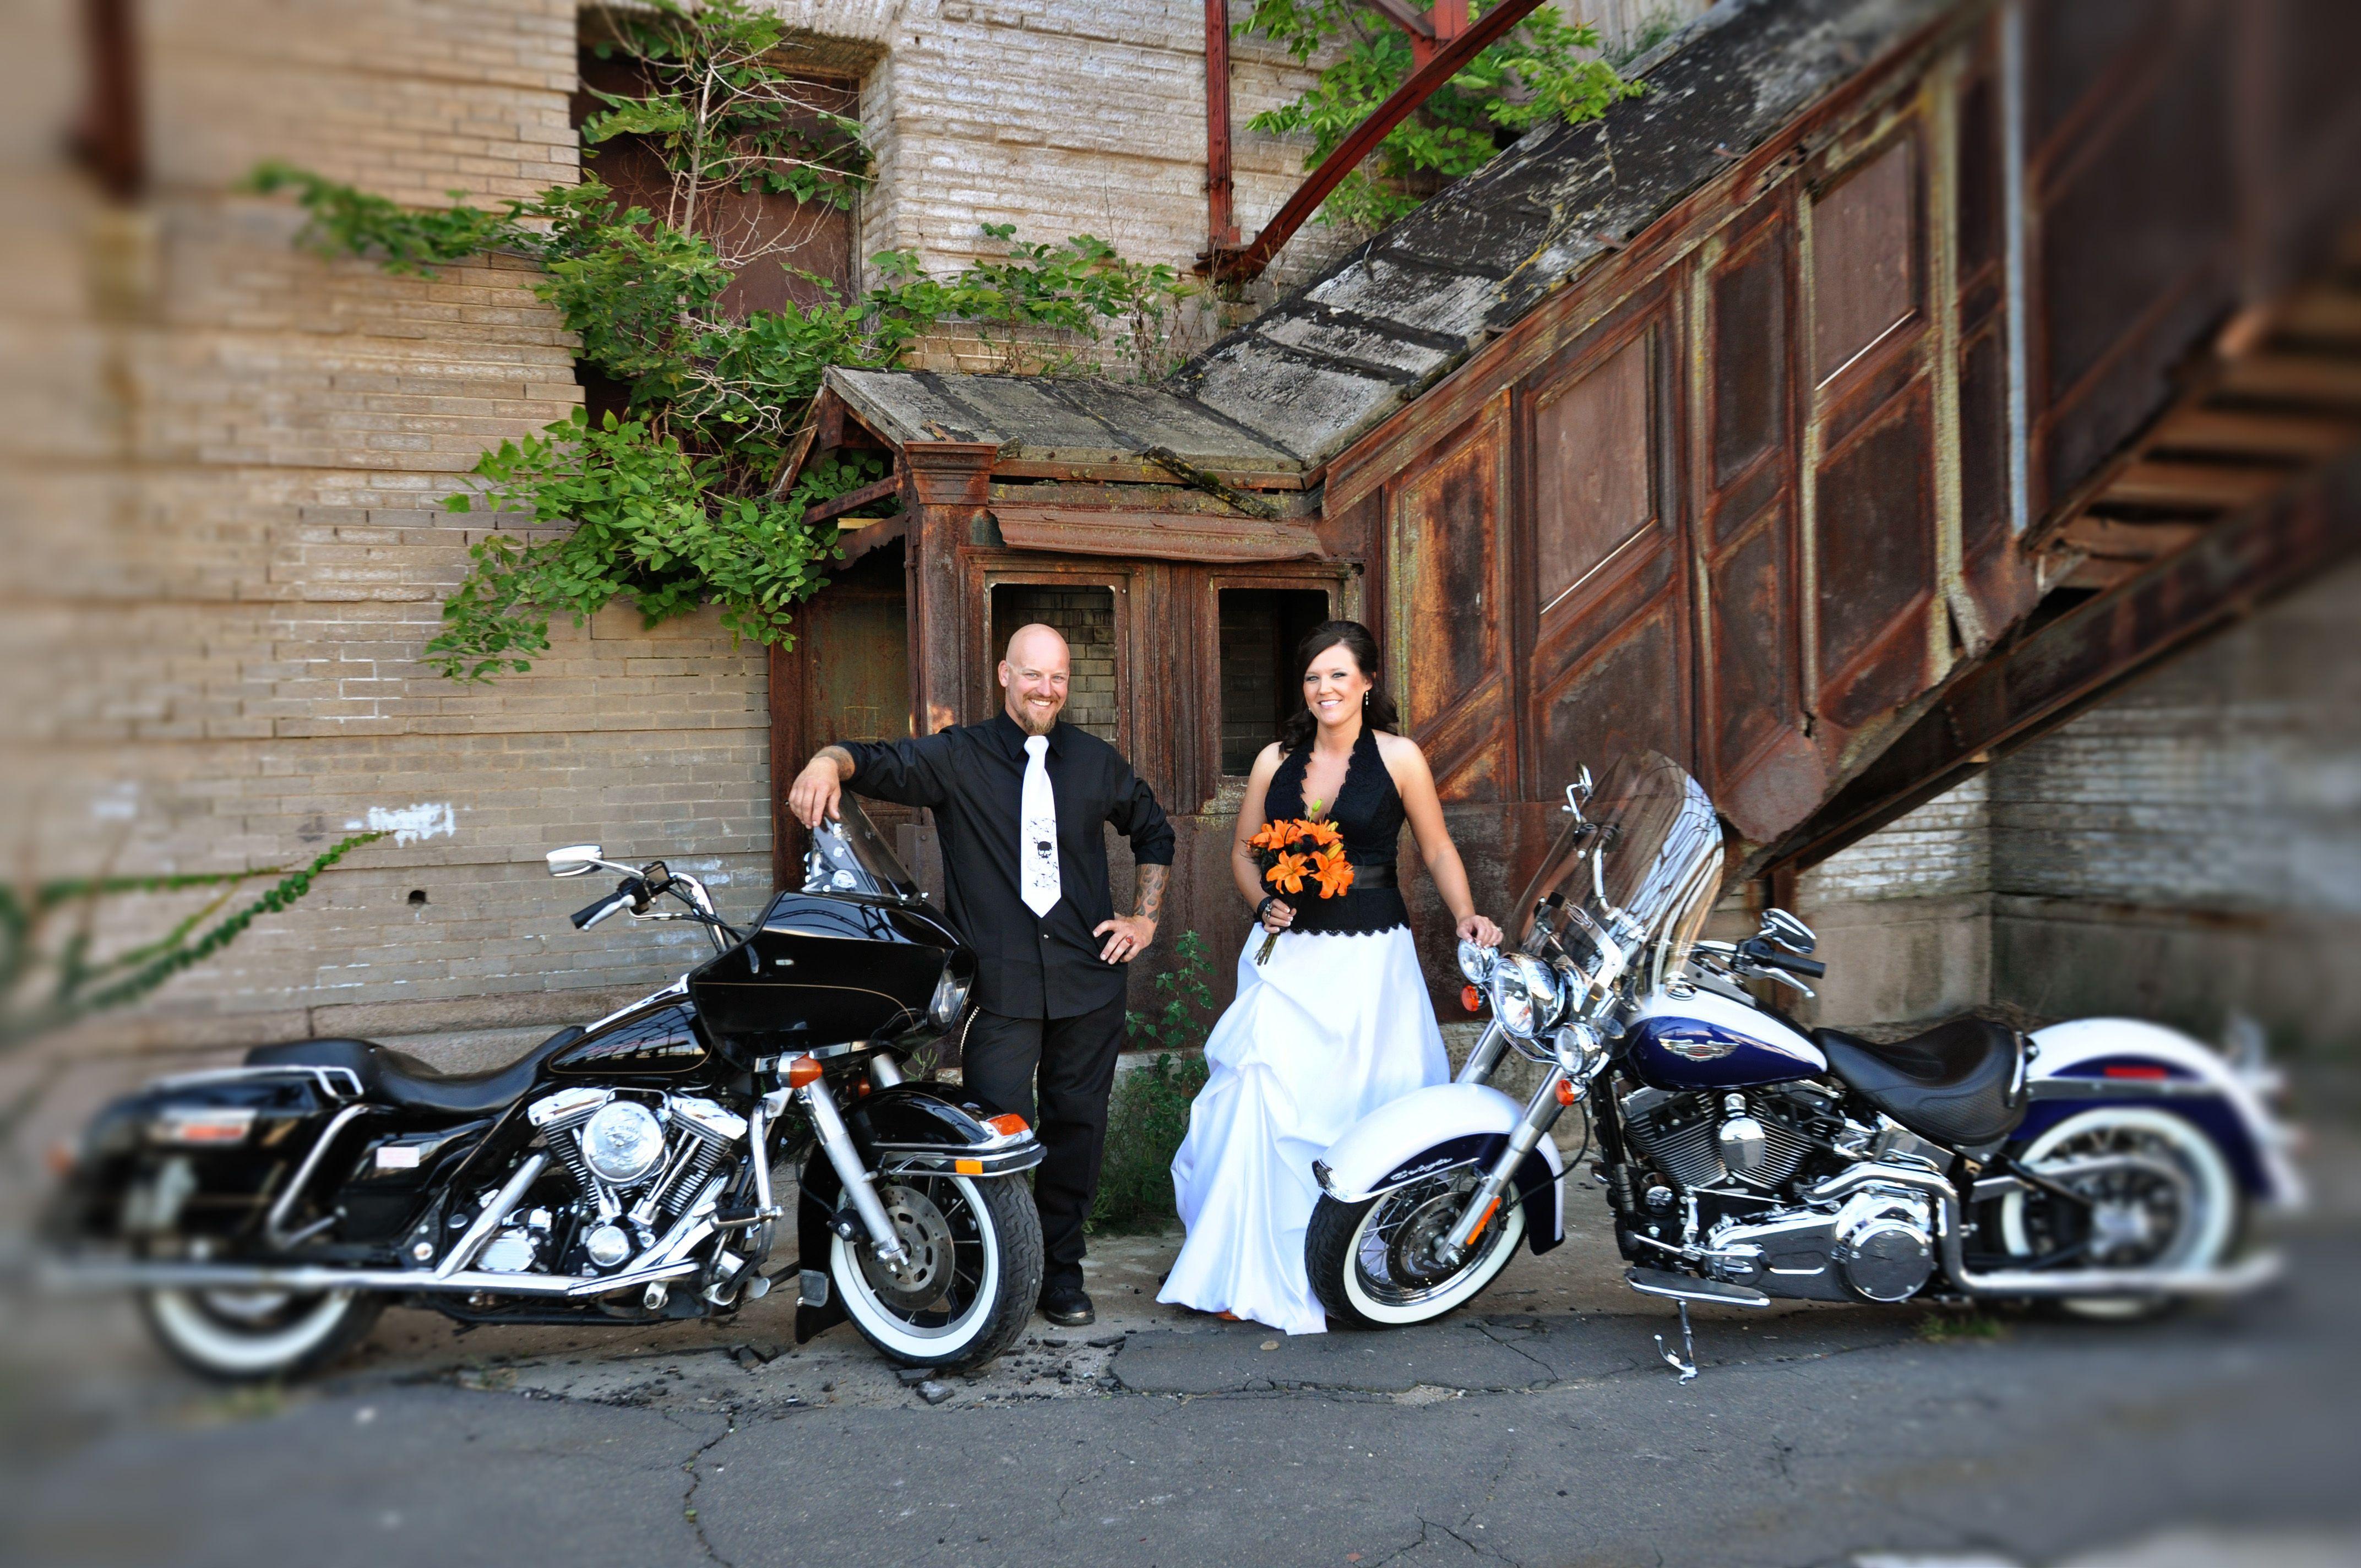 harley davidson wedding | Our Harley-Davidson Wedding- Part 1 ...